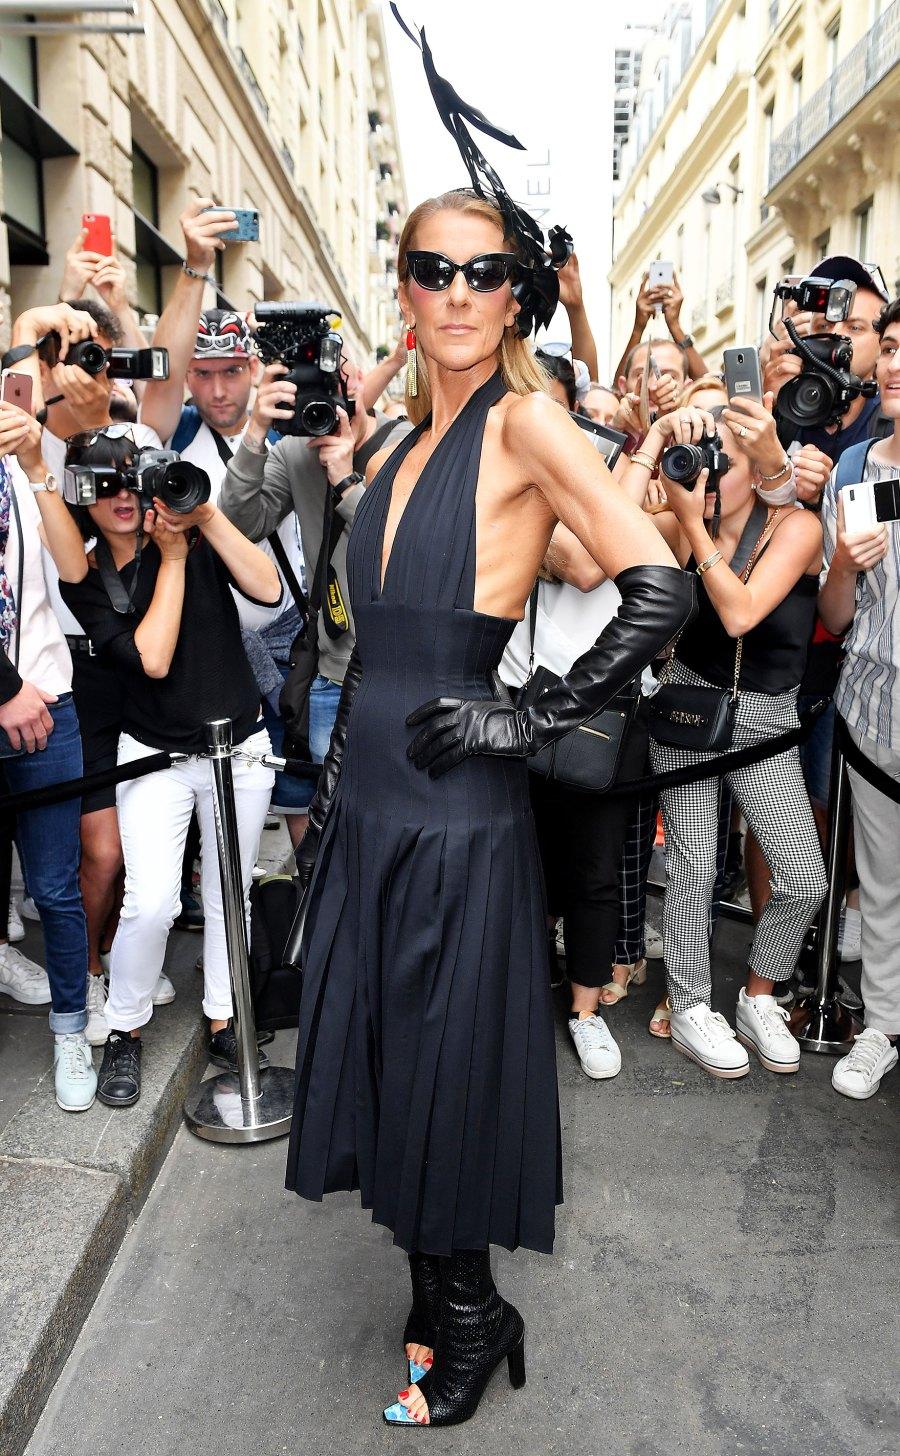 Celine Dion Black Outfit July 01, 2019